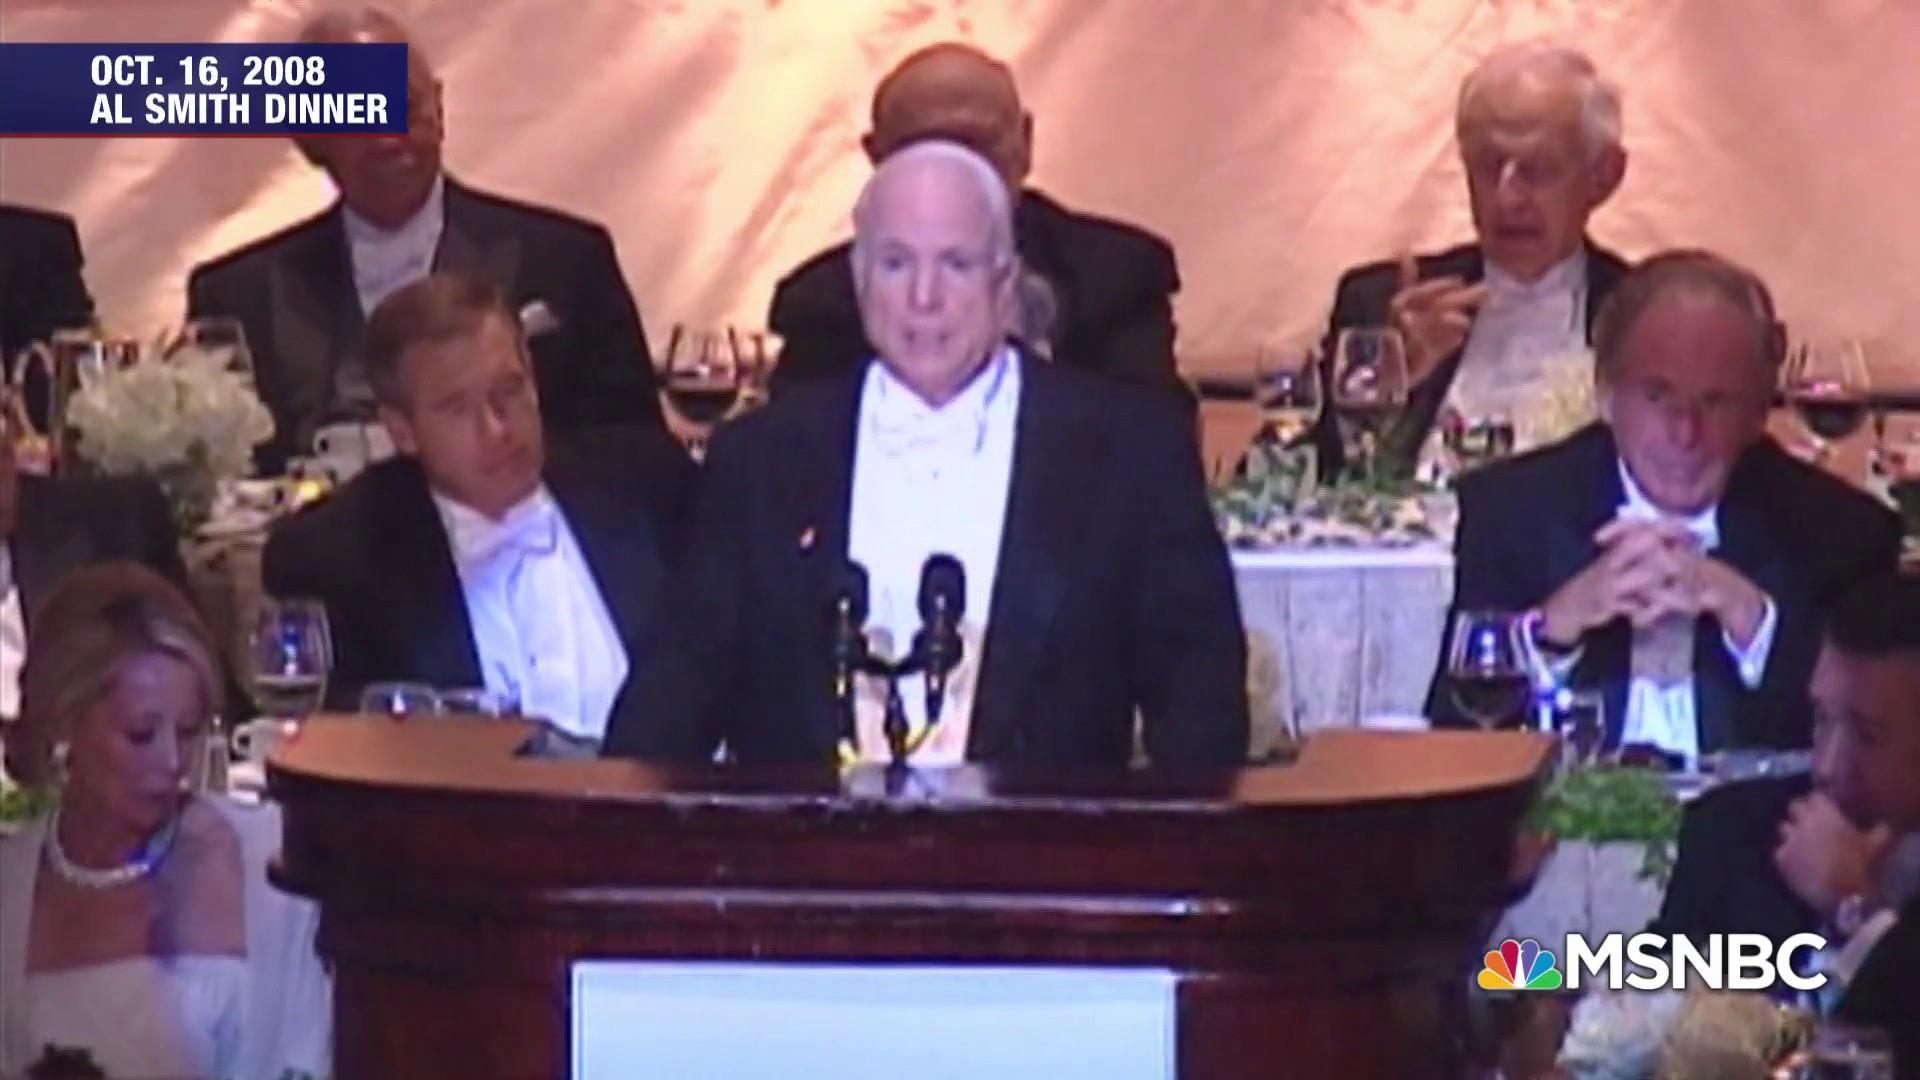 Matthews: Senator McCain is a role model